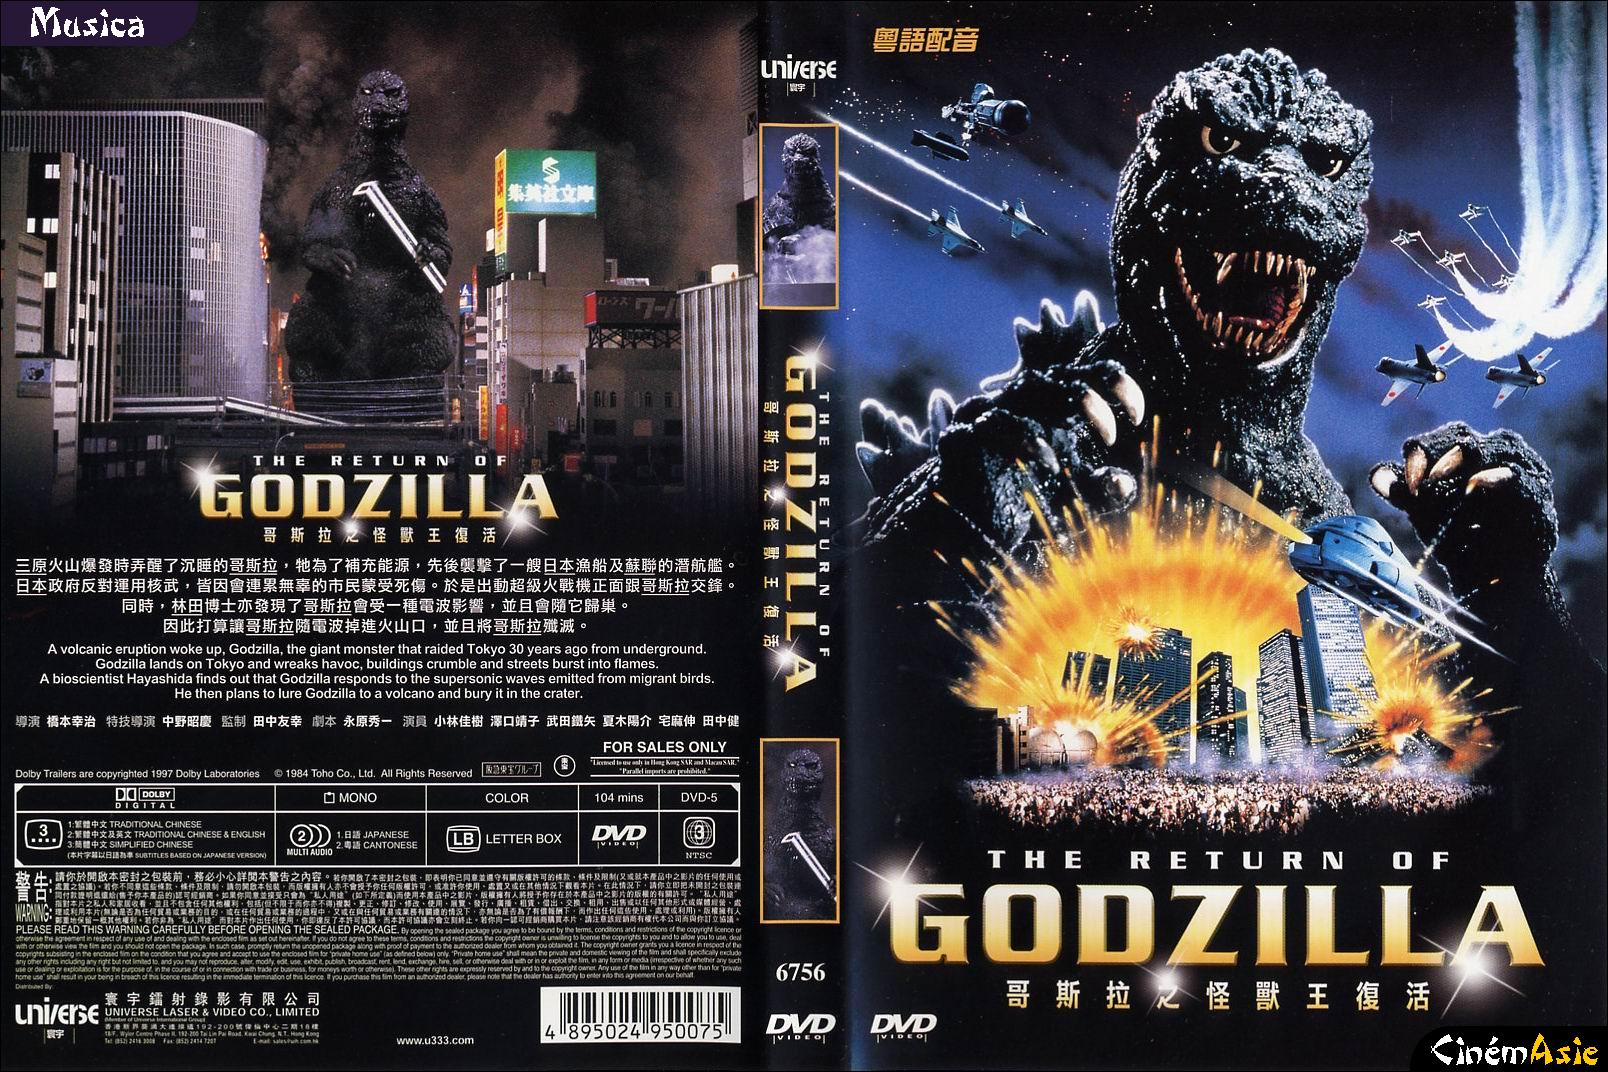 The Return Of Godzilla 9